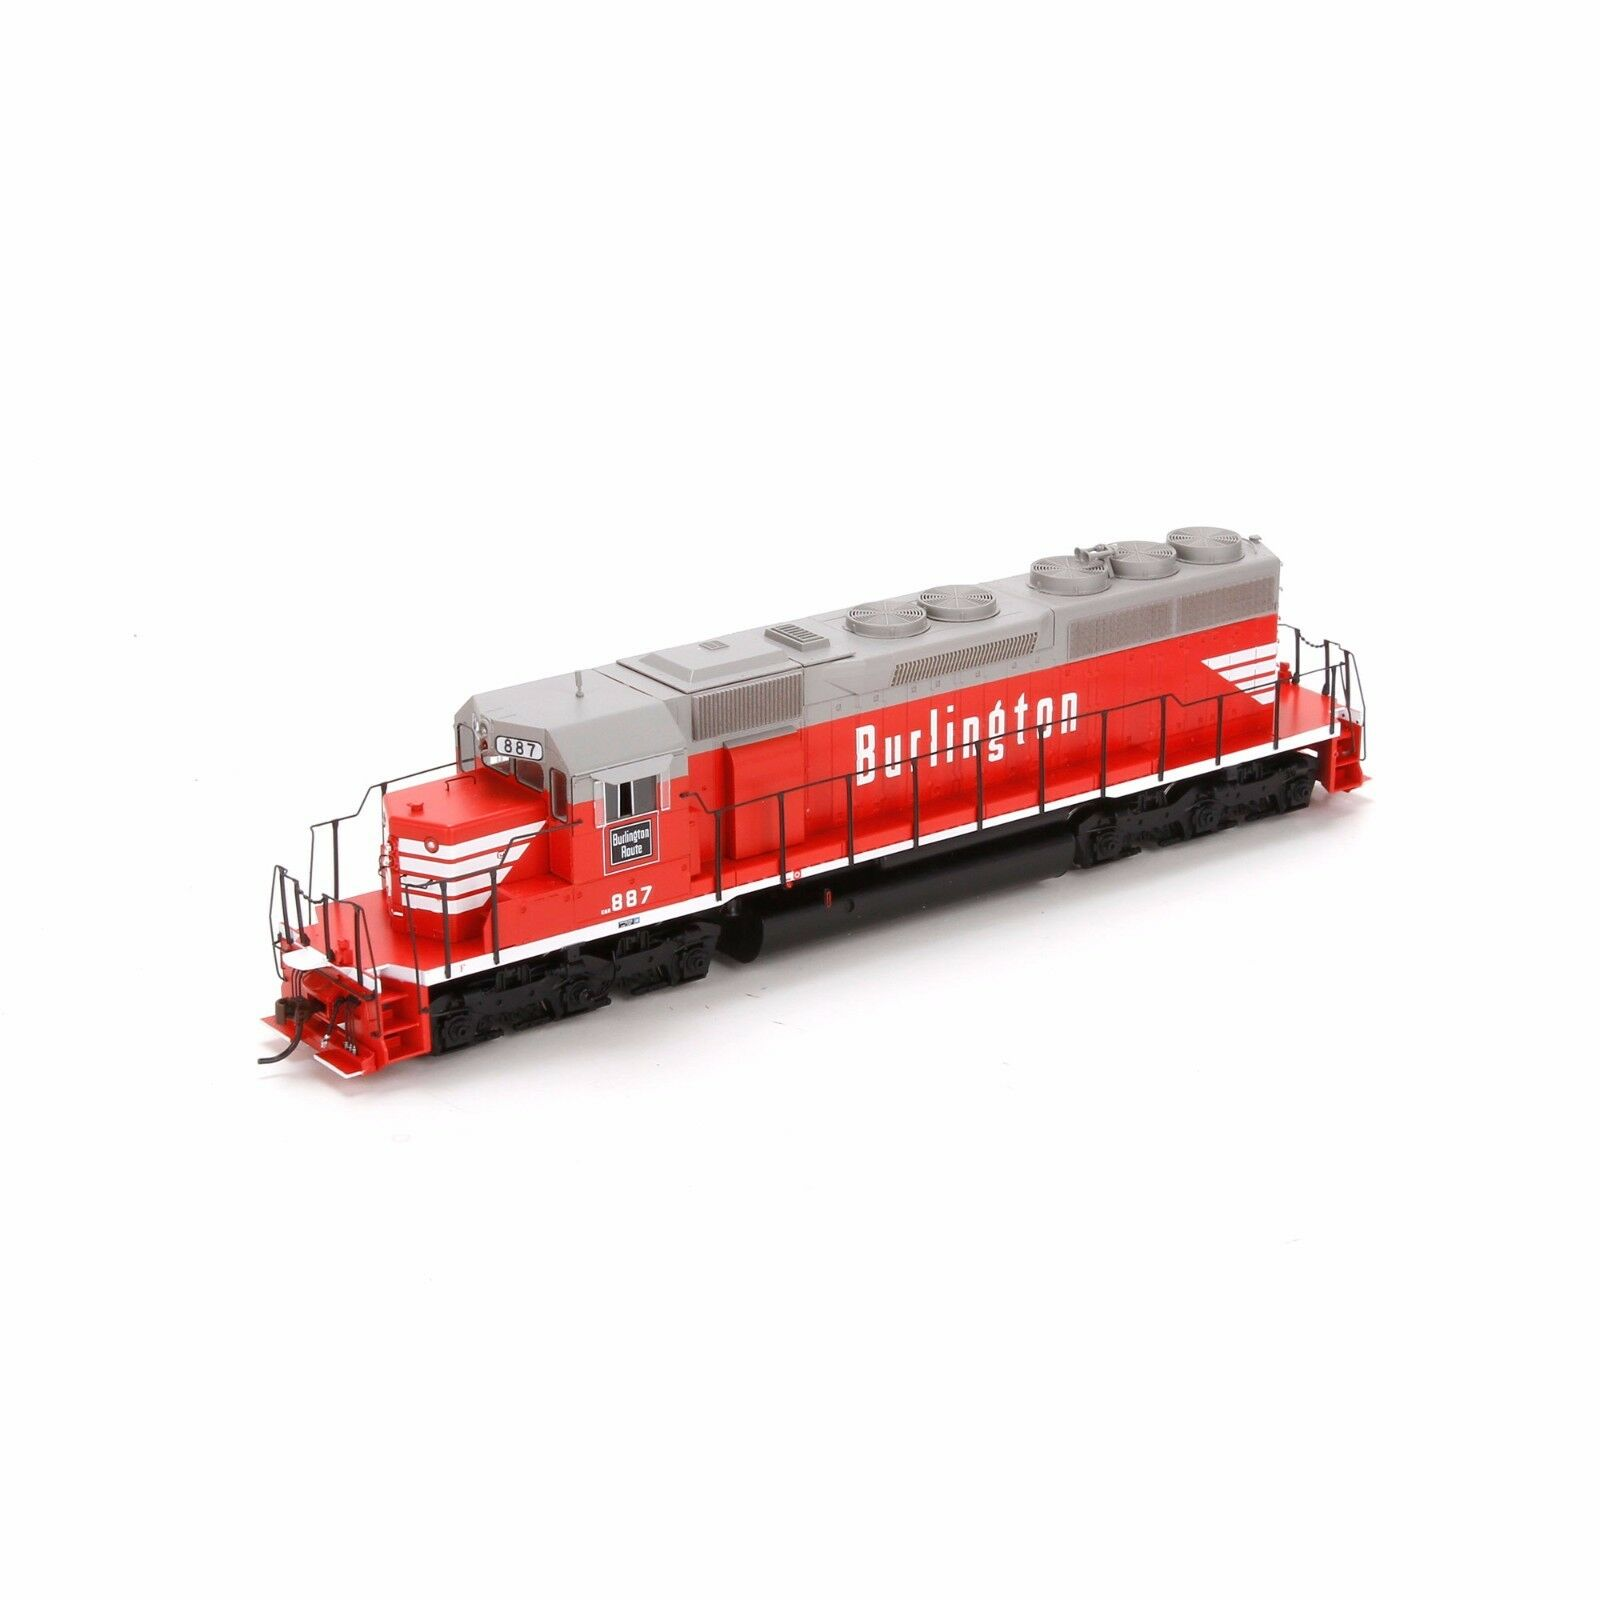 HO Scale SD40 Locomotive w DCC &C suono - CB&Q C&S  887 - Athearn  98807